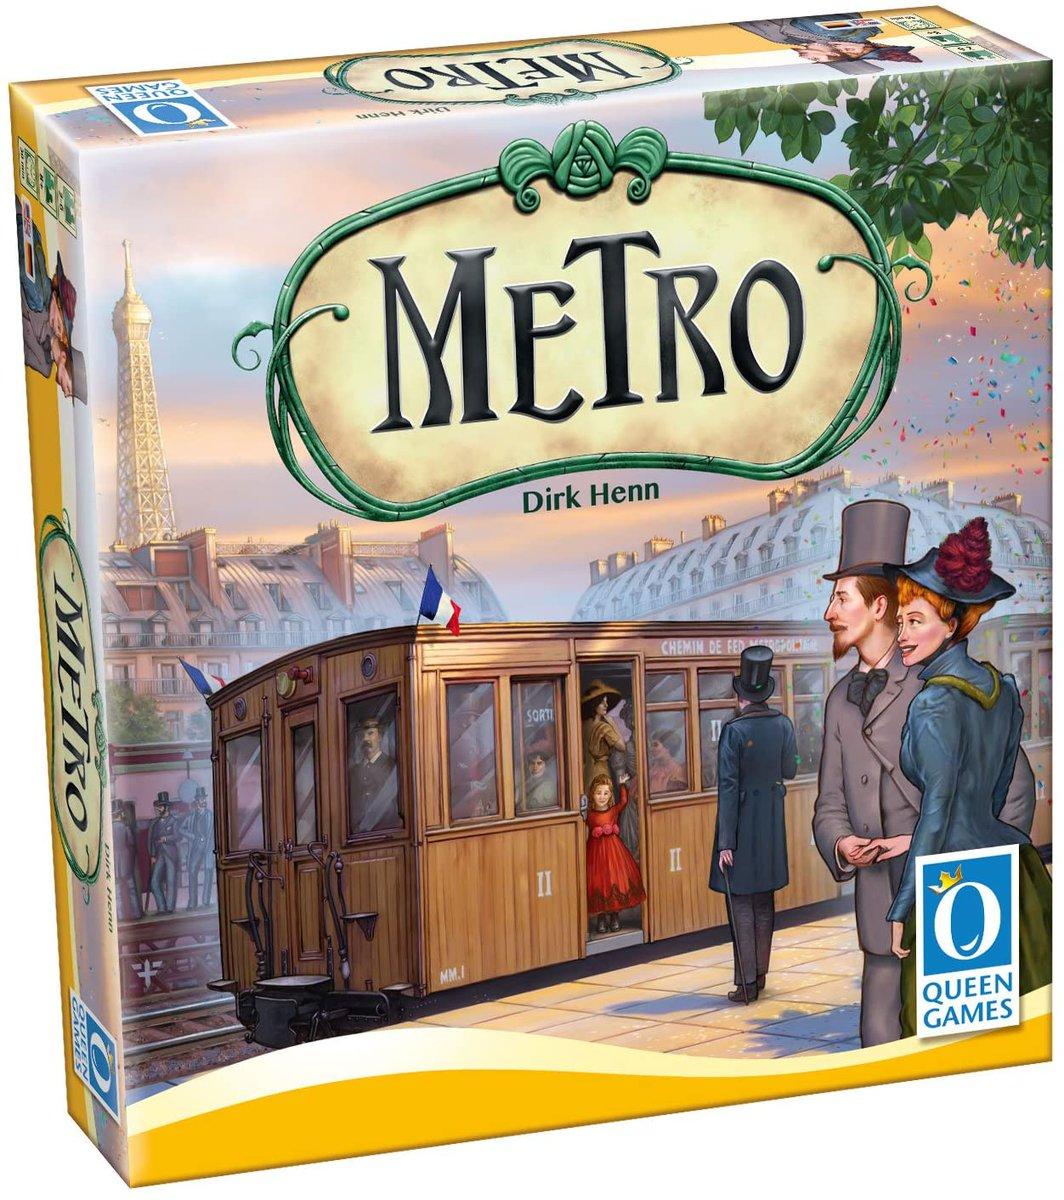 Metro for 41% off.  Under $24.  #ad  TGDrepost